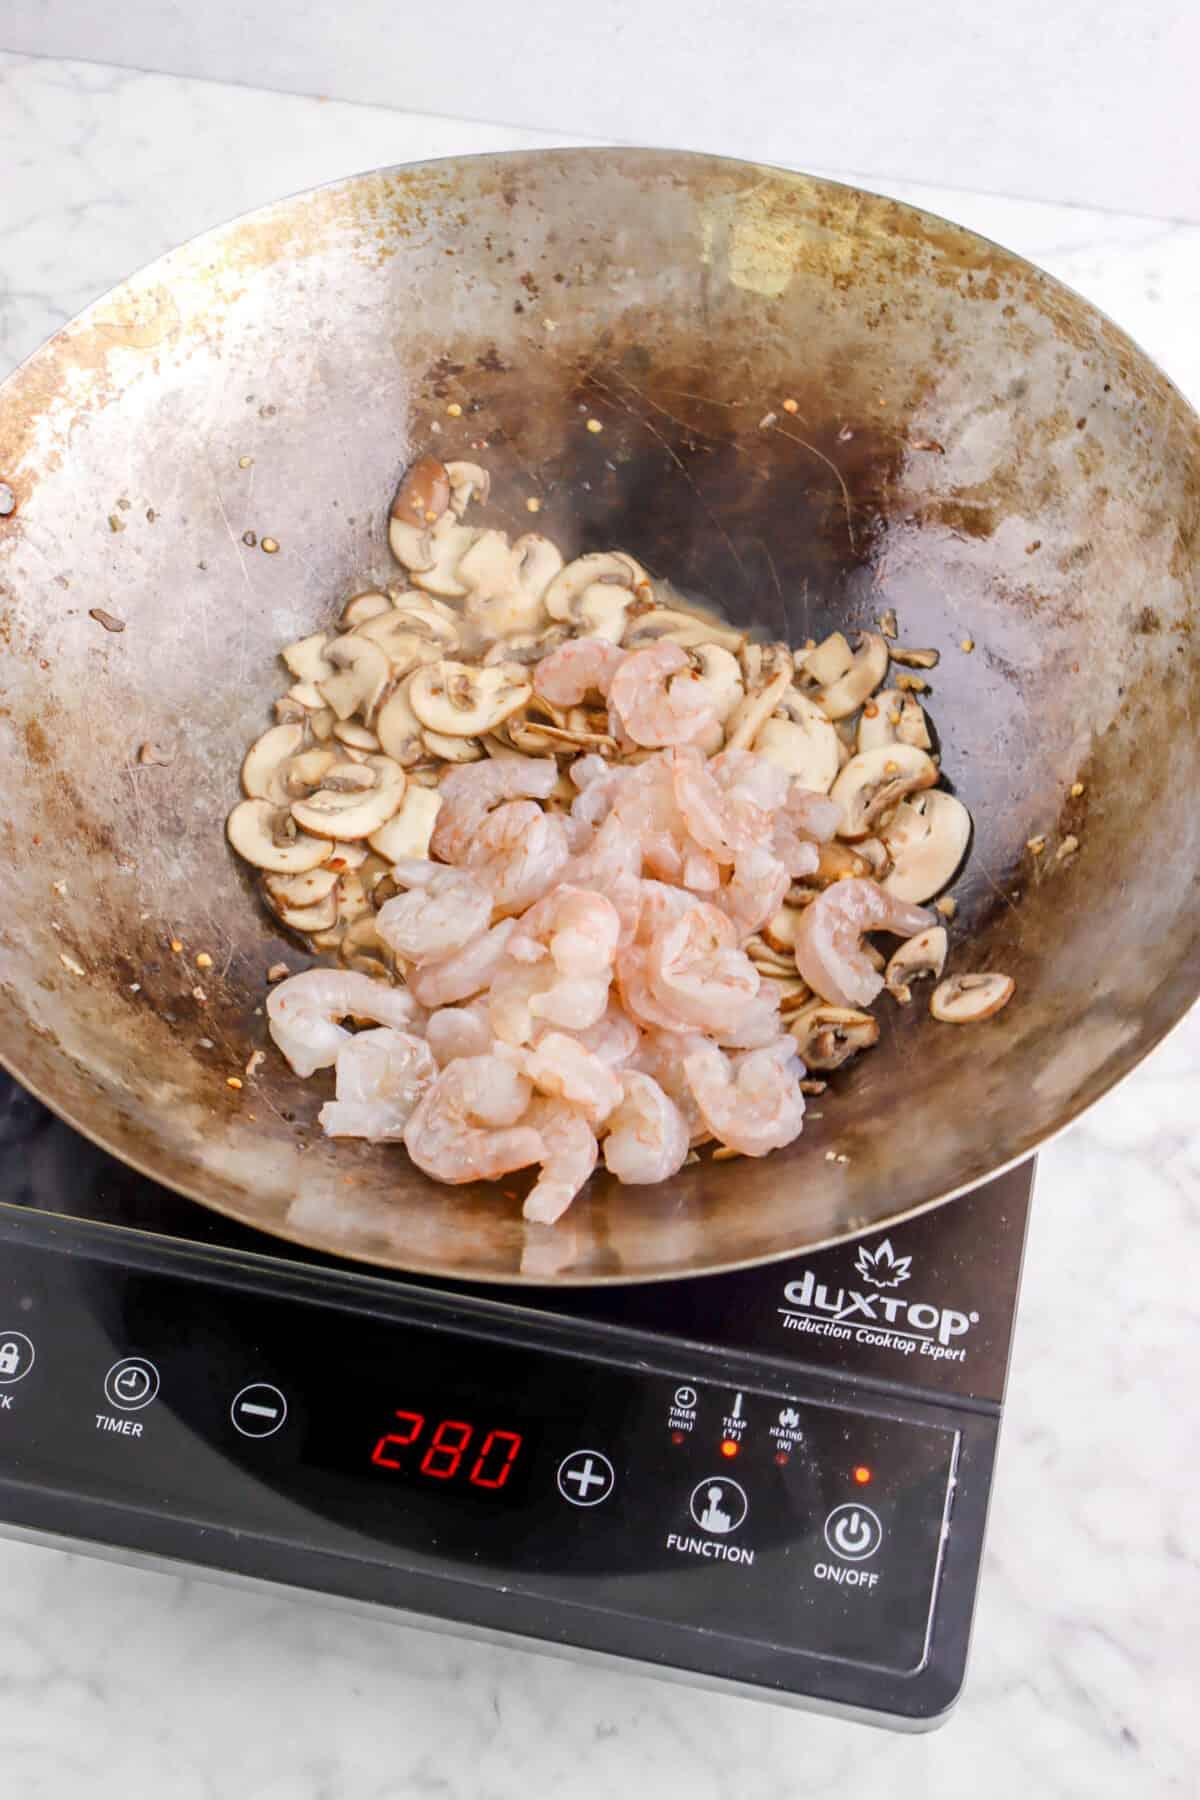 raw shrimp added to sautéed mushrooms